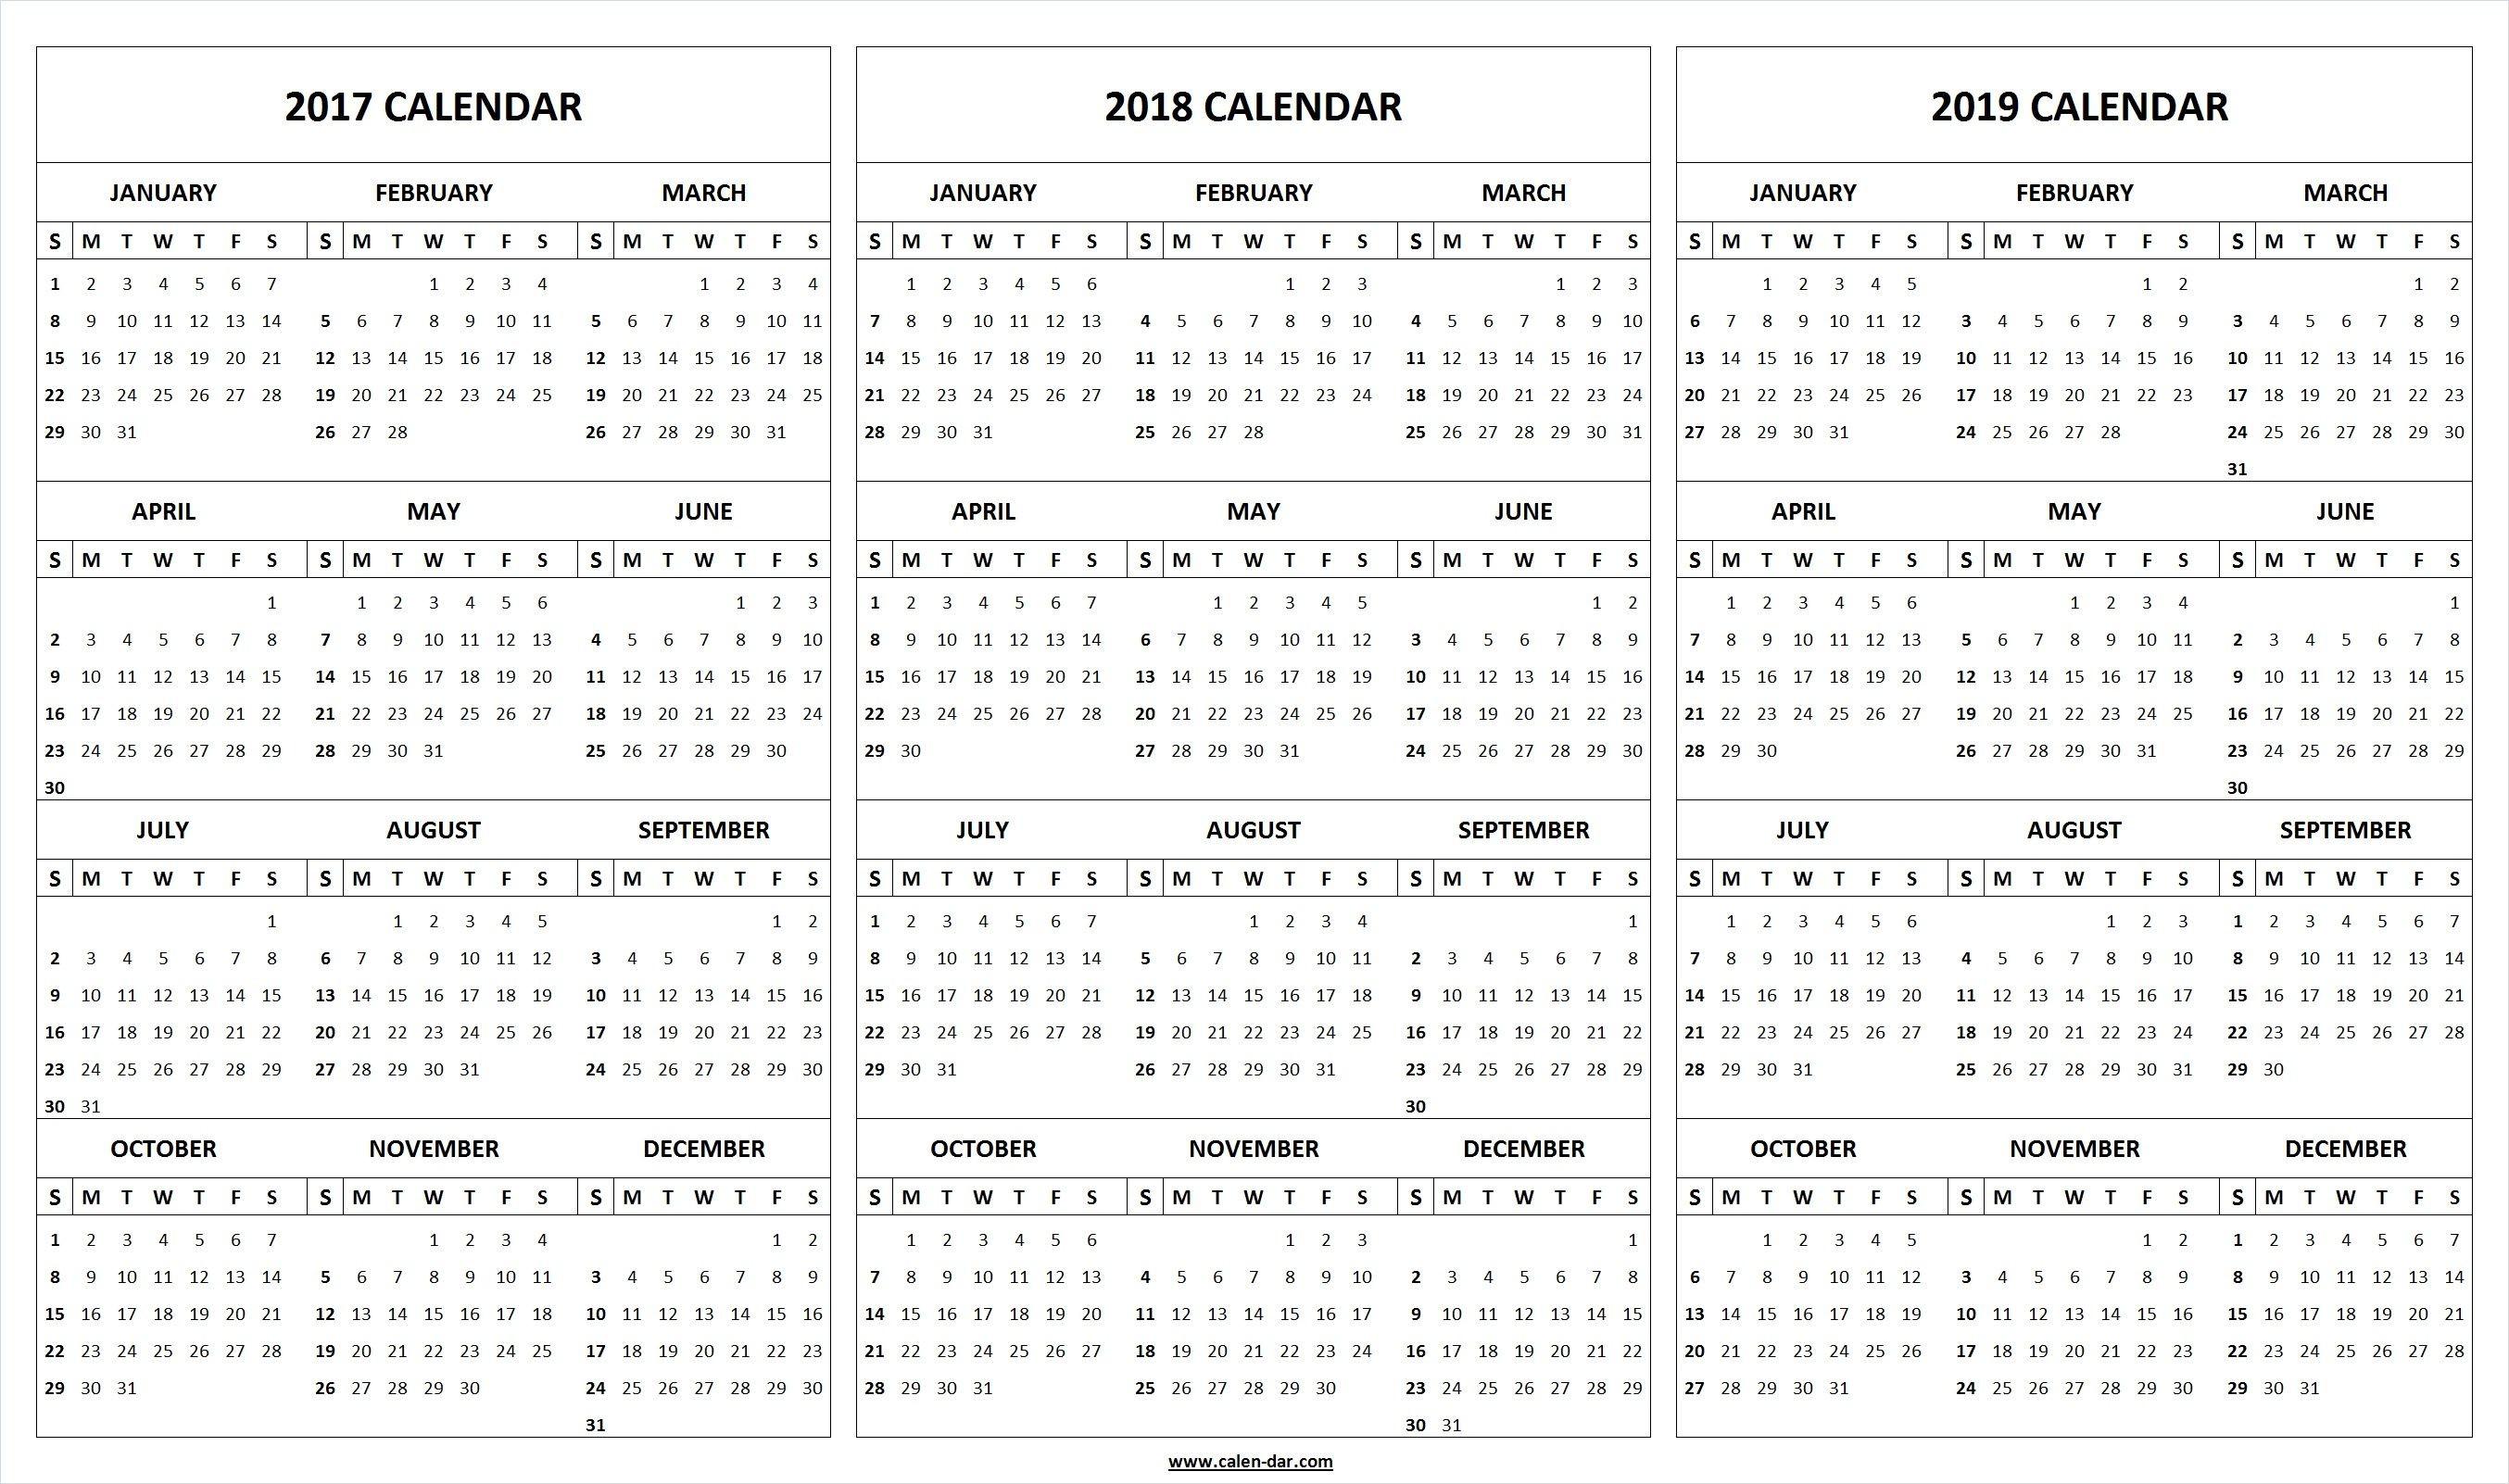 Get free blank printable 2017 2018 2019 Calendar template These editable 2017 2018 2019 Calendar